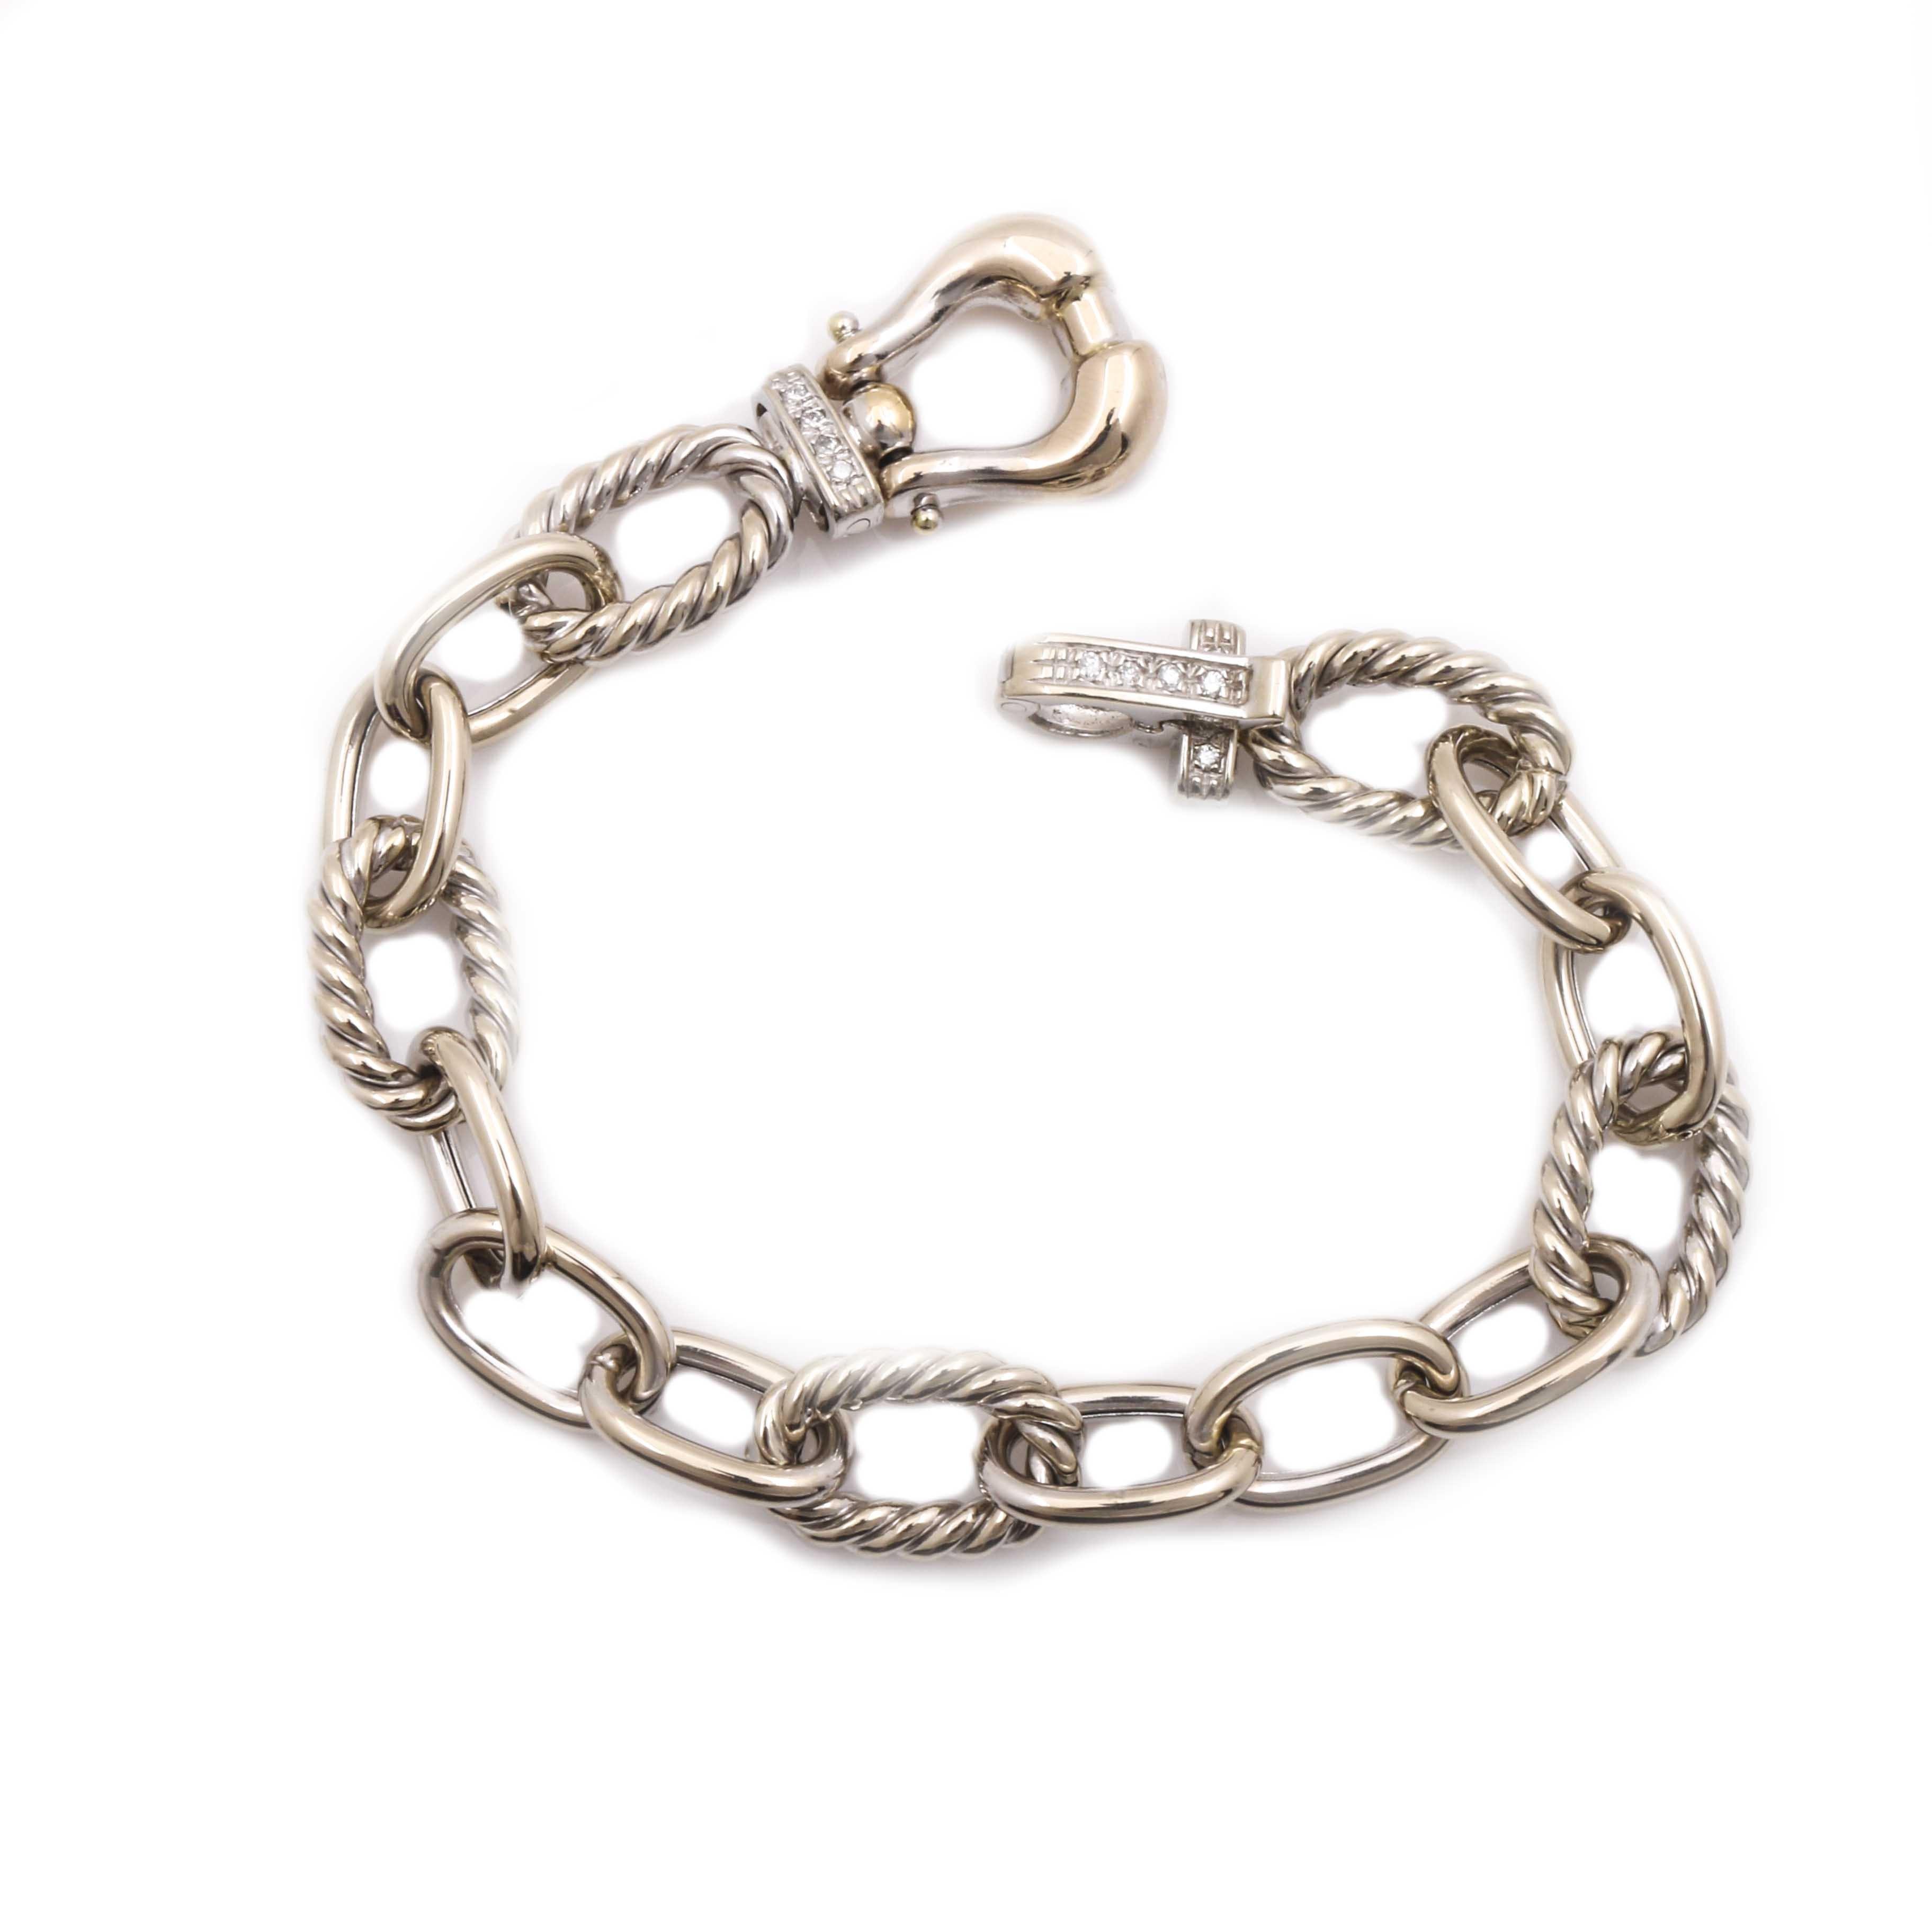 14K White Gold Oval Link Bracelet With Diamond Accents